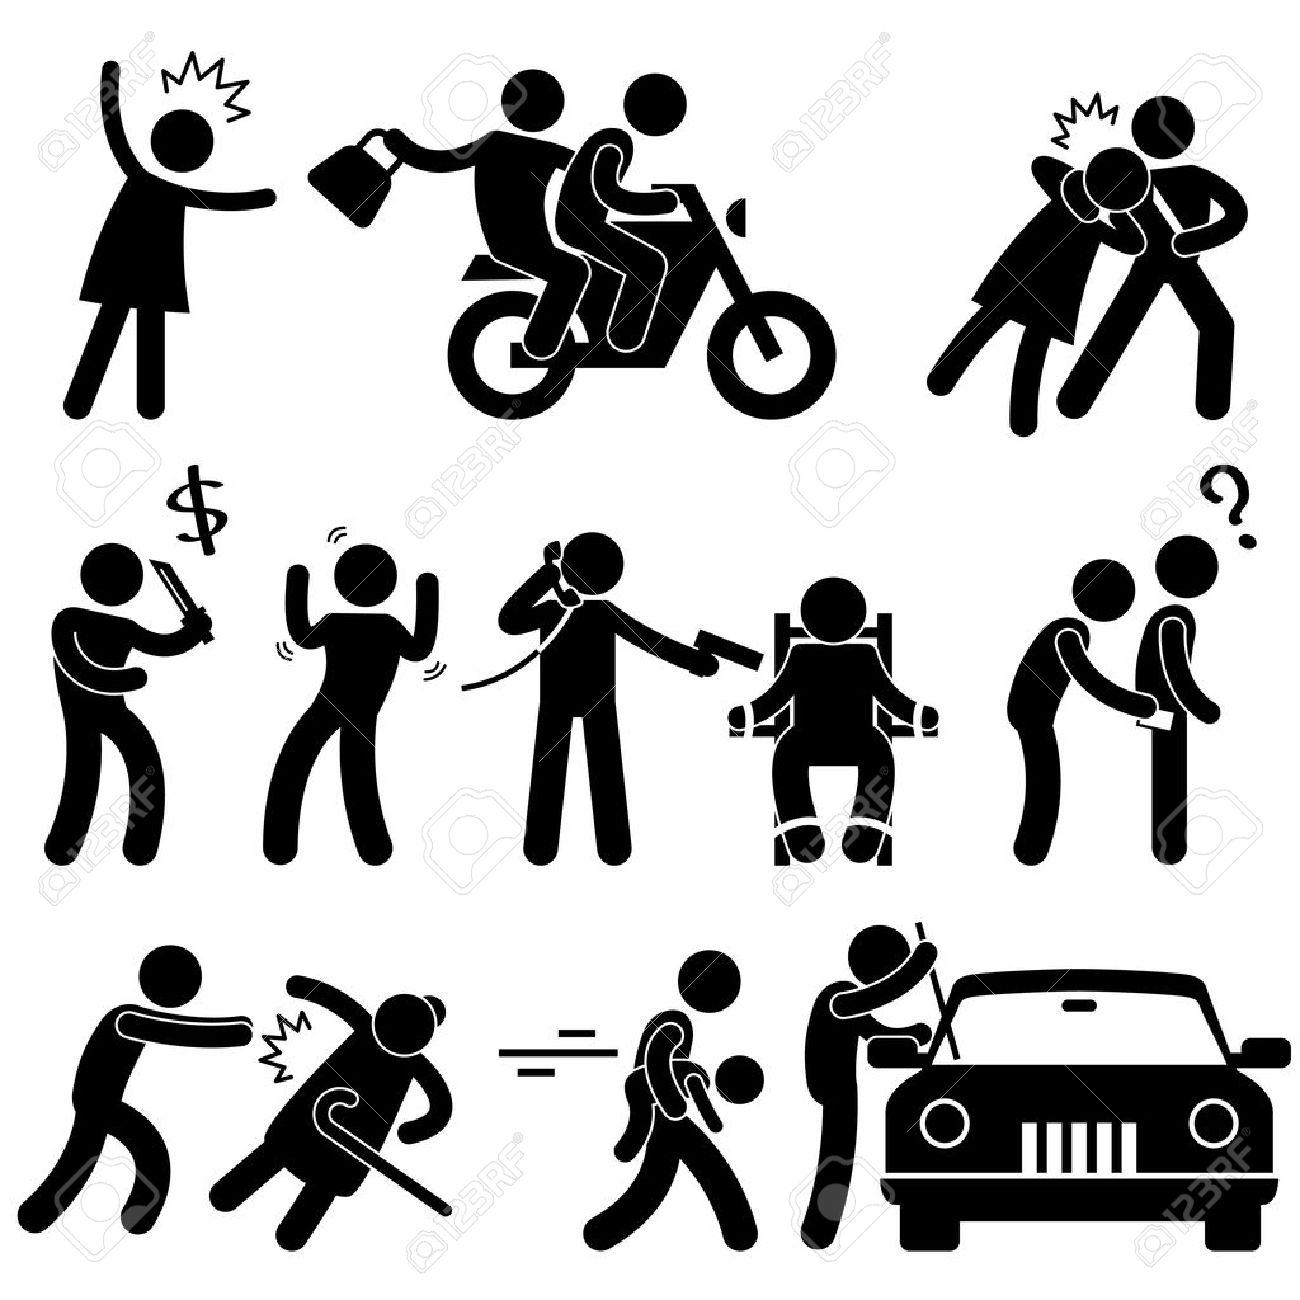 Criminal Robber Burglar Kidnapper Rapist Thief Icon Symbol Sign Pictogram Stock Vector - 15209859